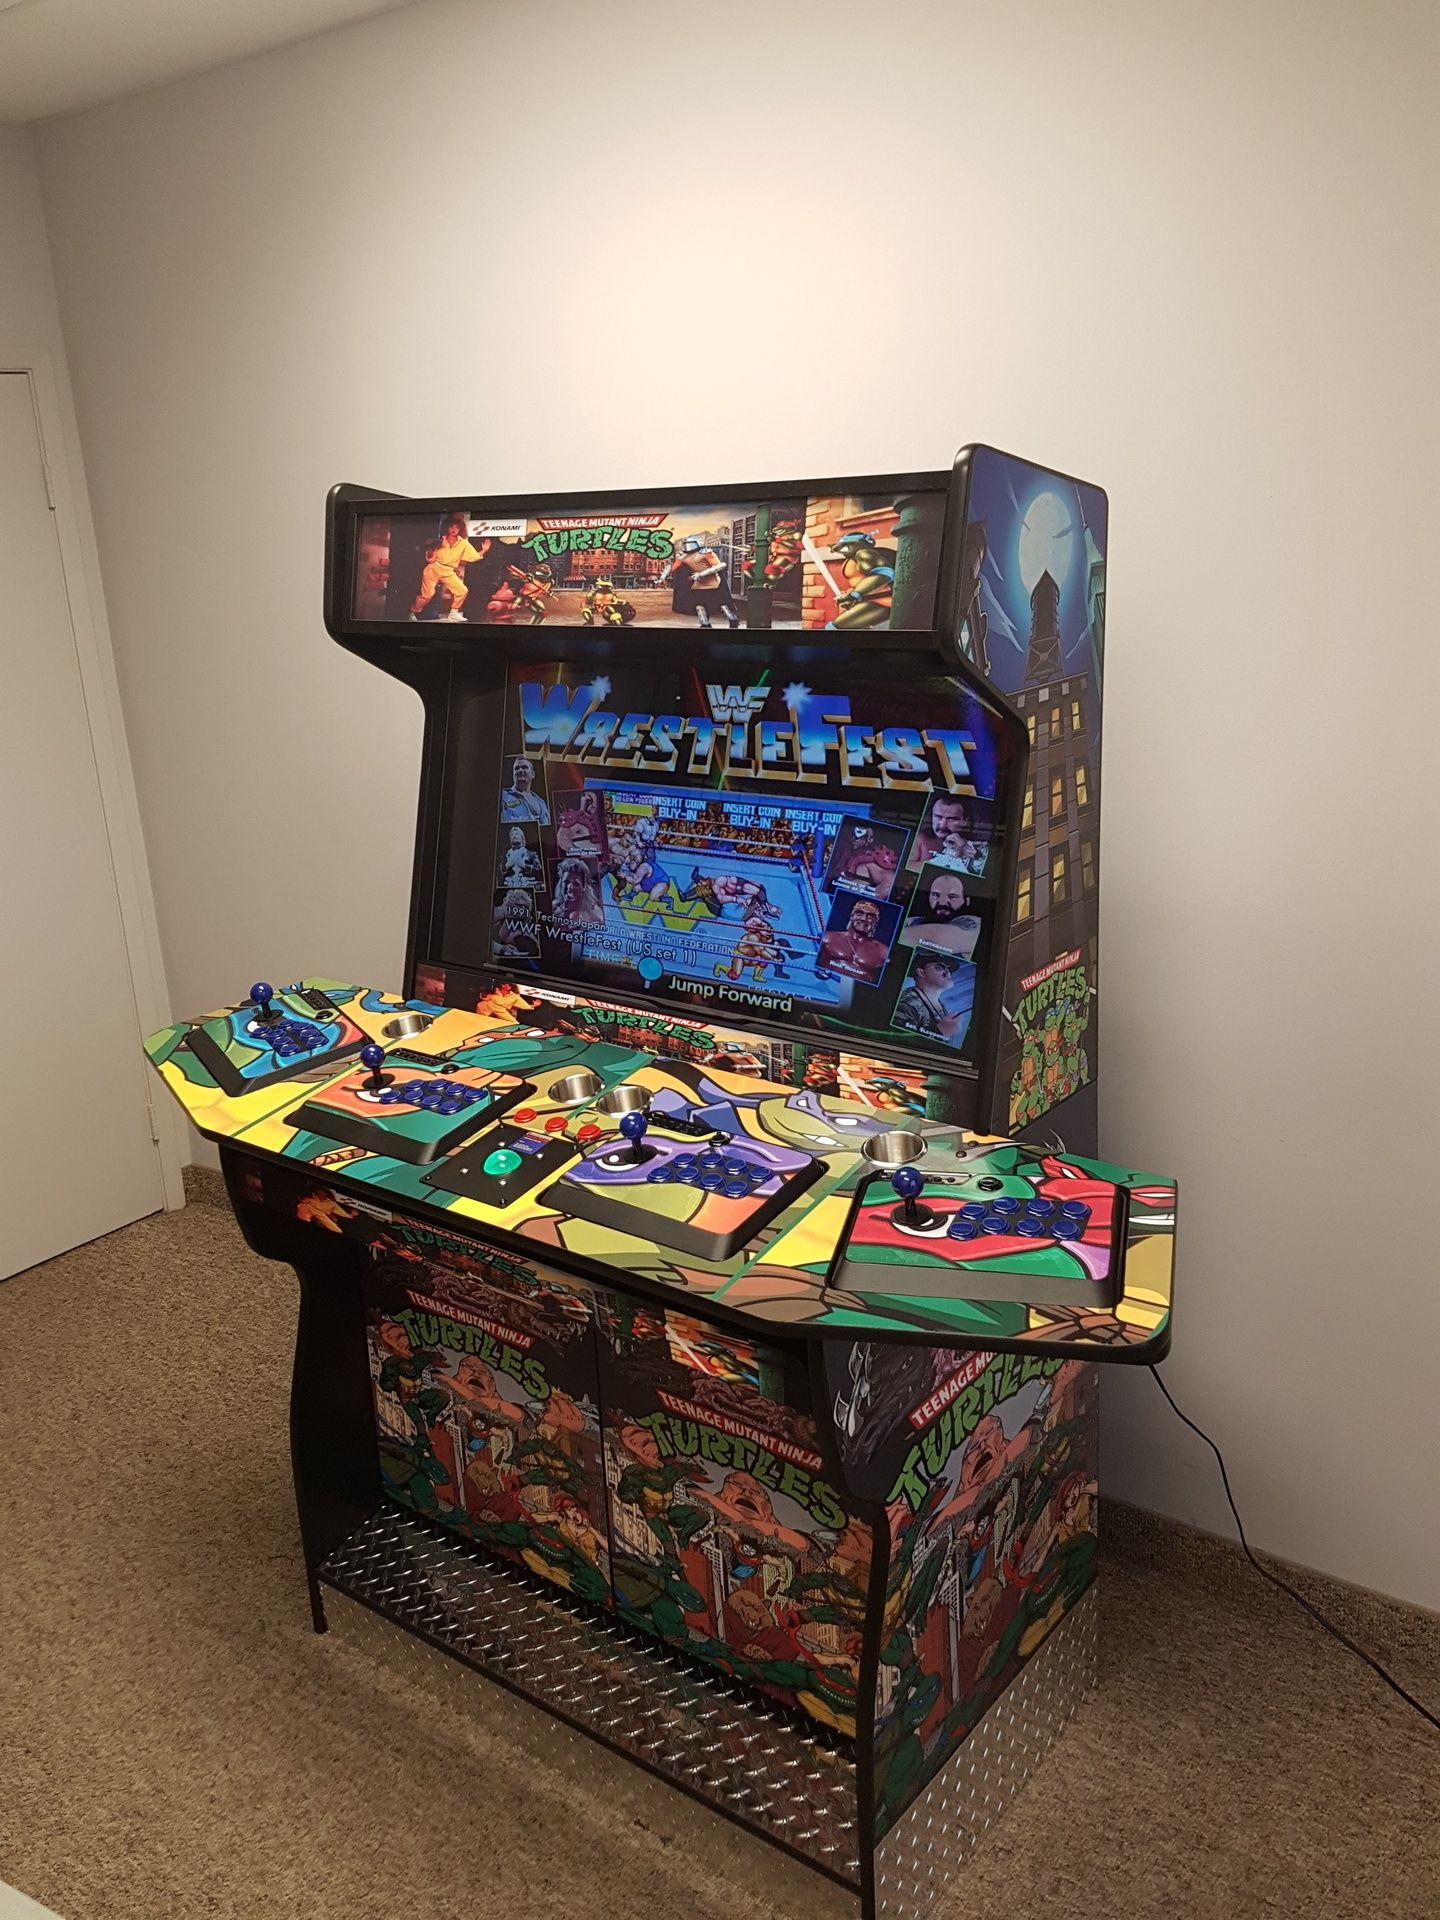 Related image Arcade Arcade machine, Arcade